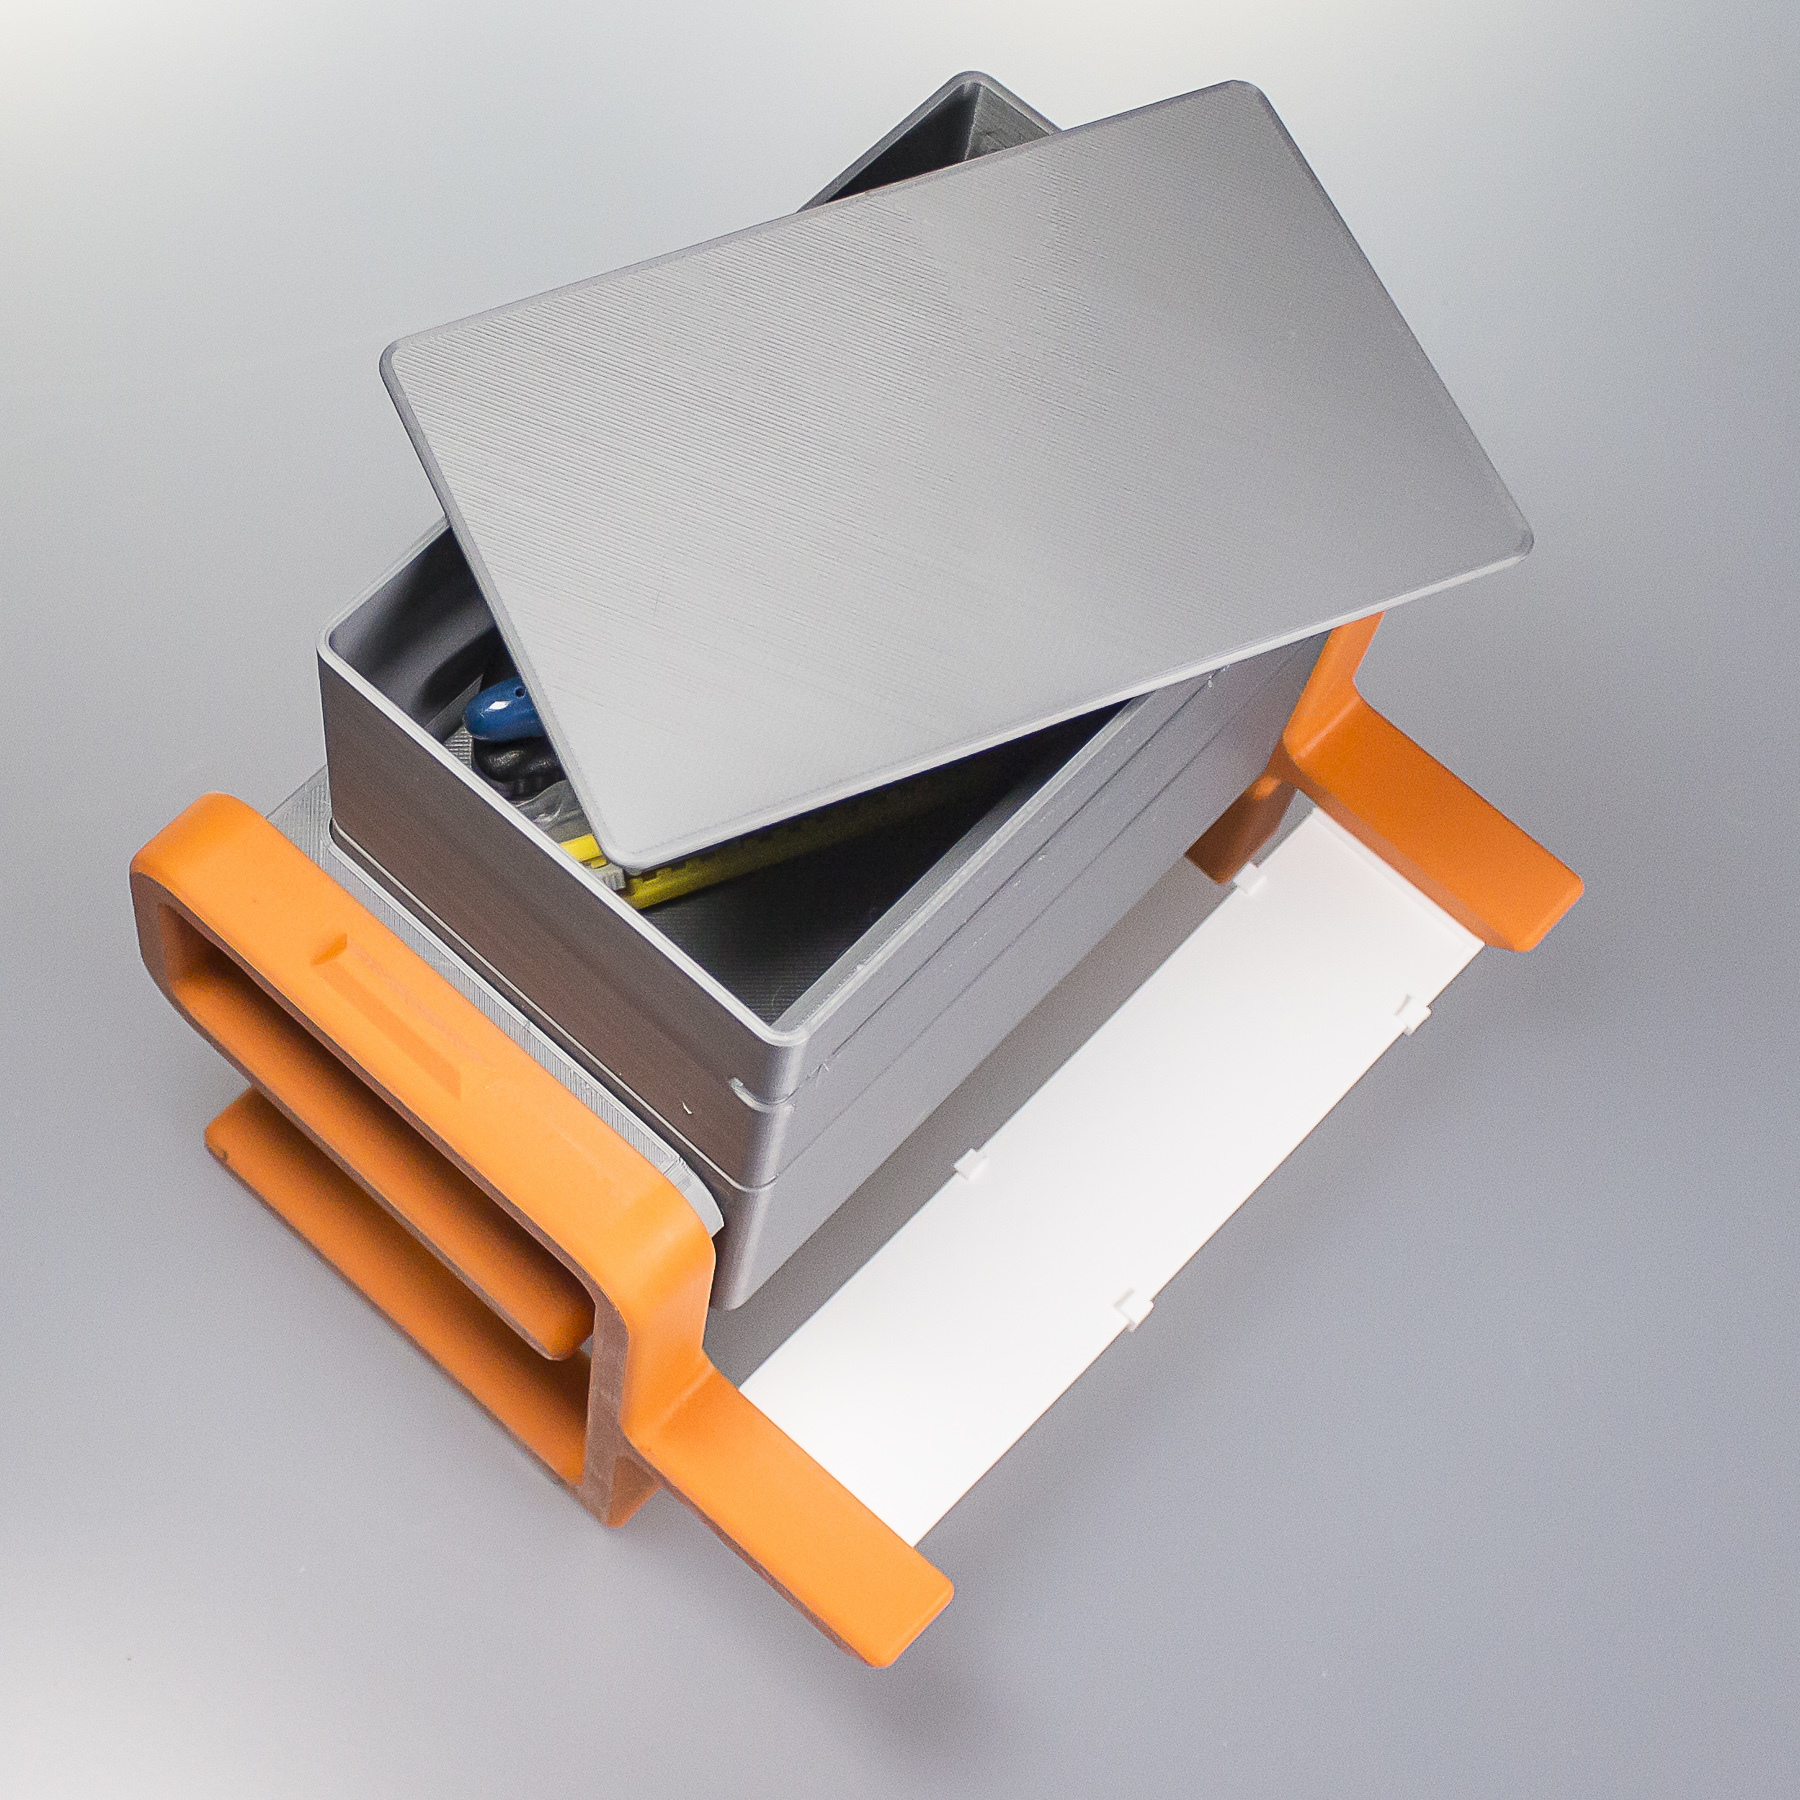 _MG_2015.jpg Download STL file Inkynato • 3D print design, CKLab